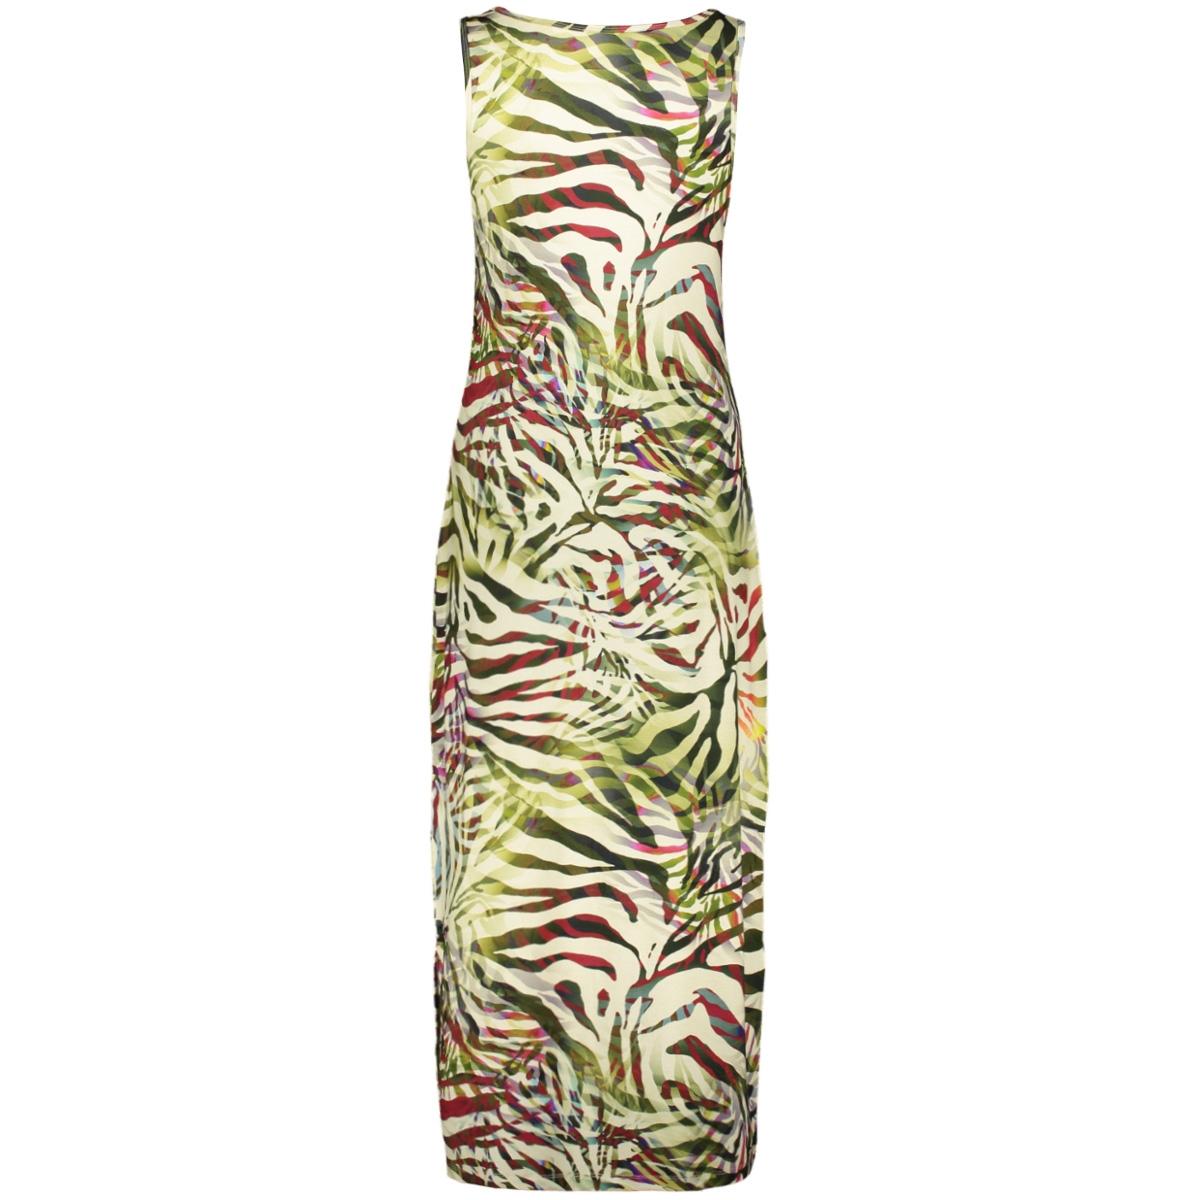 river dress sleeveless 07043 60 geisha jurk army/red